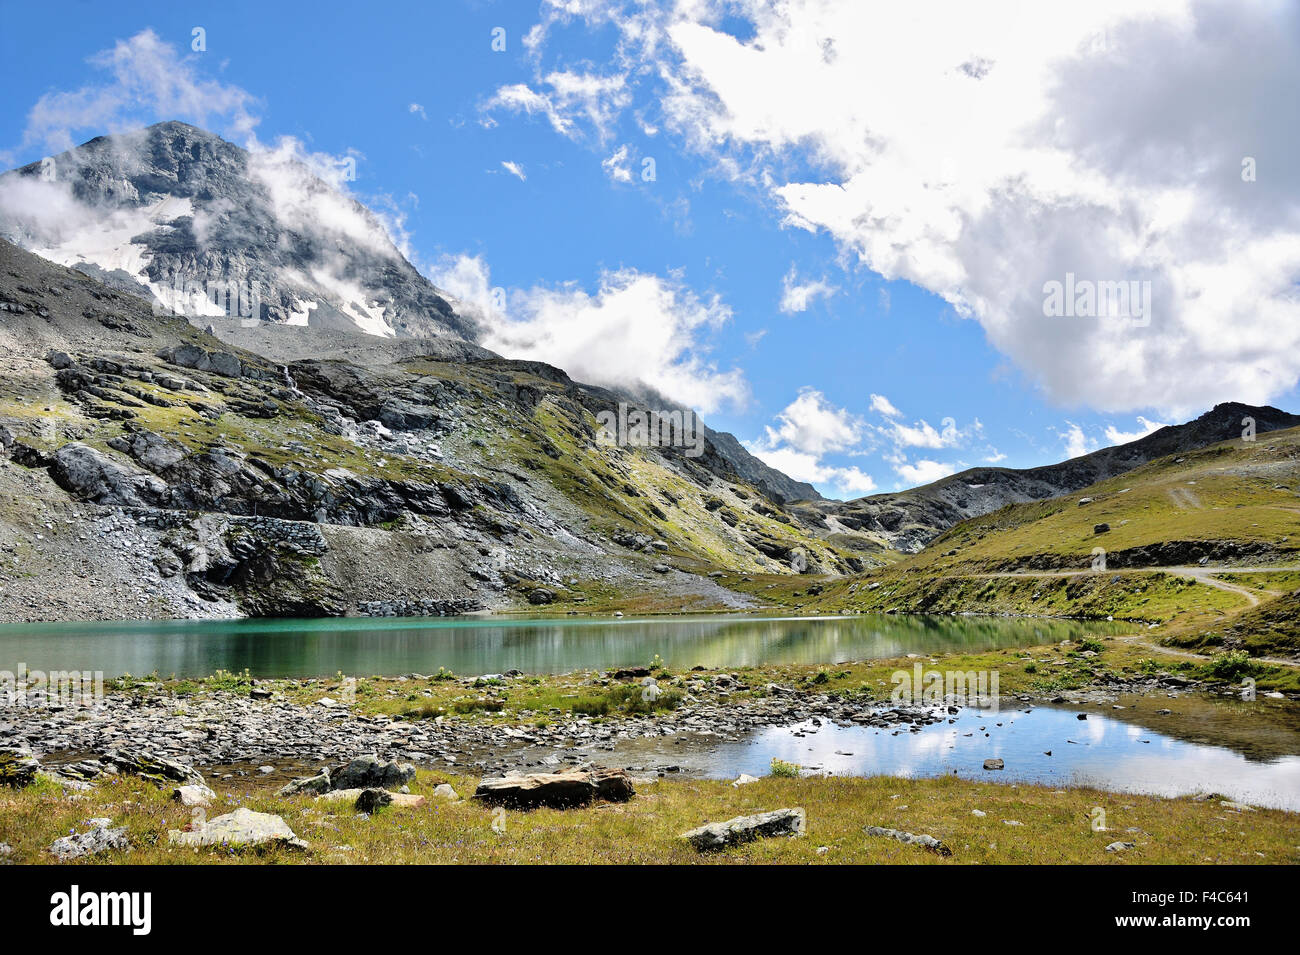 Mountain Lake Lac Marlou, Les Arcs, Bourg, French Alps, France - Stock Image